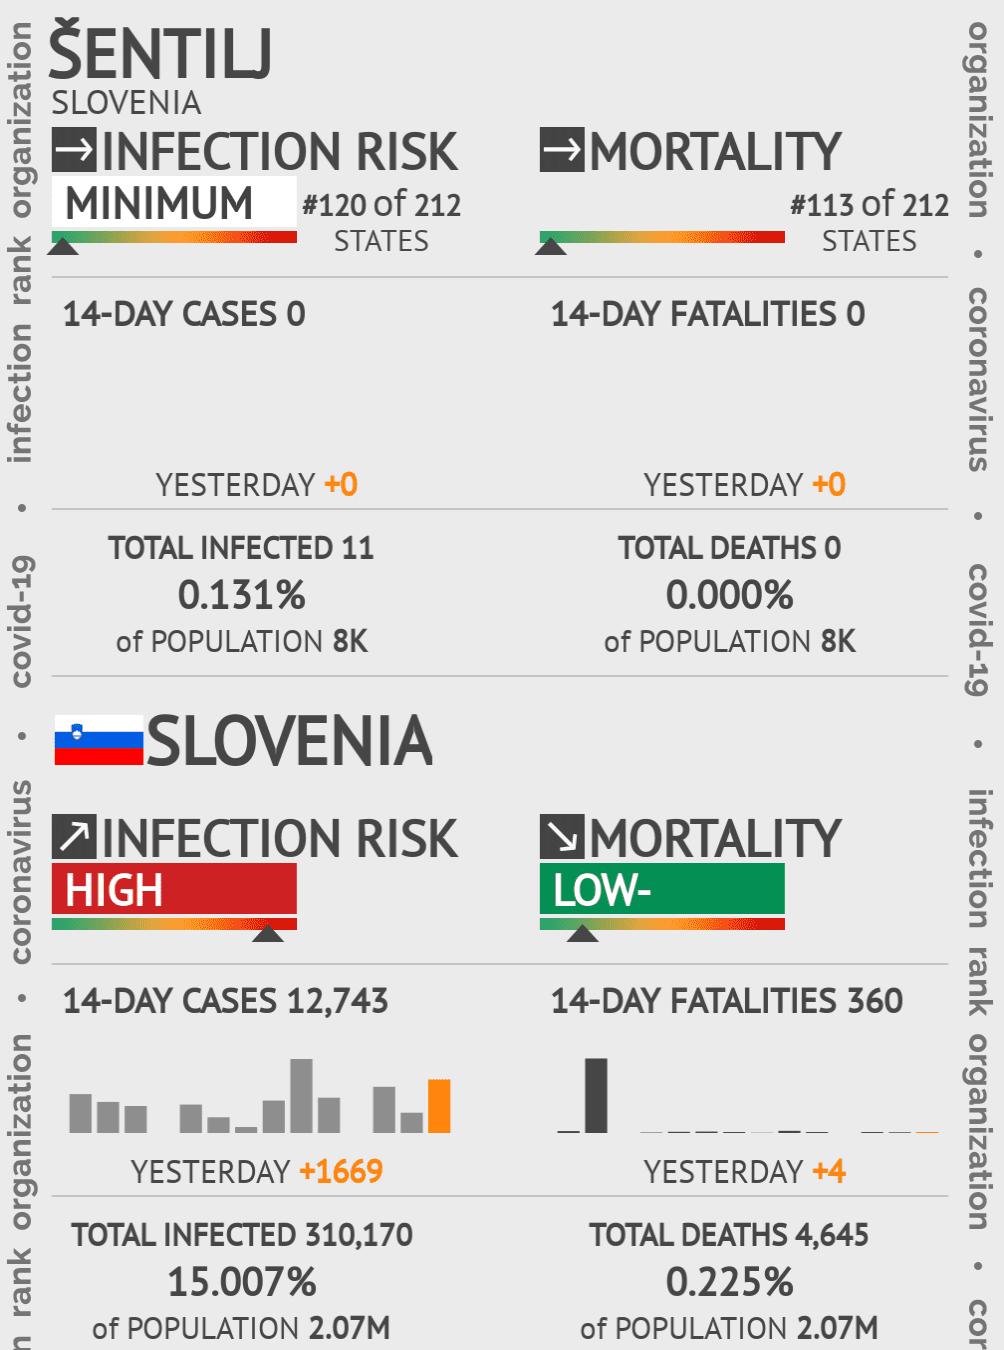 Šentilj Coronavirus Covid-19 Risk of Infection on May 14, 2020